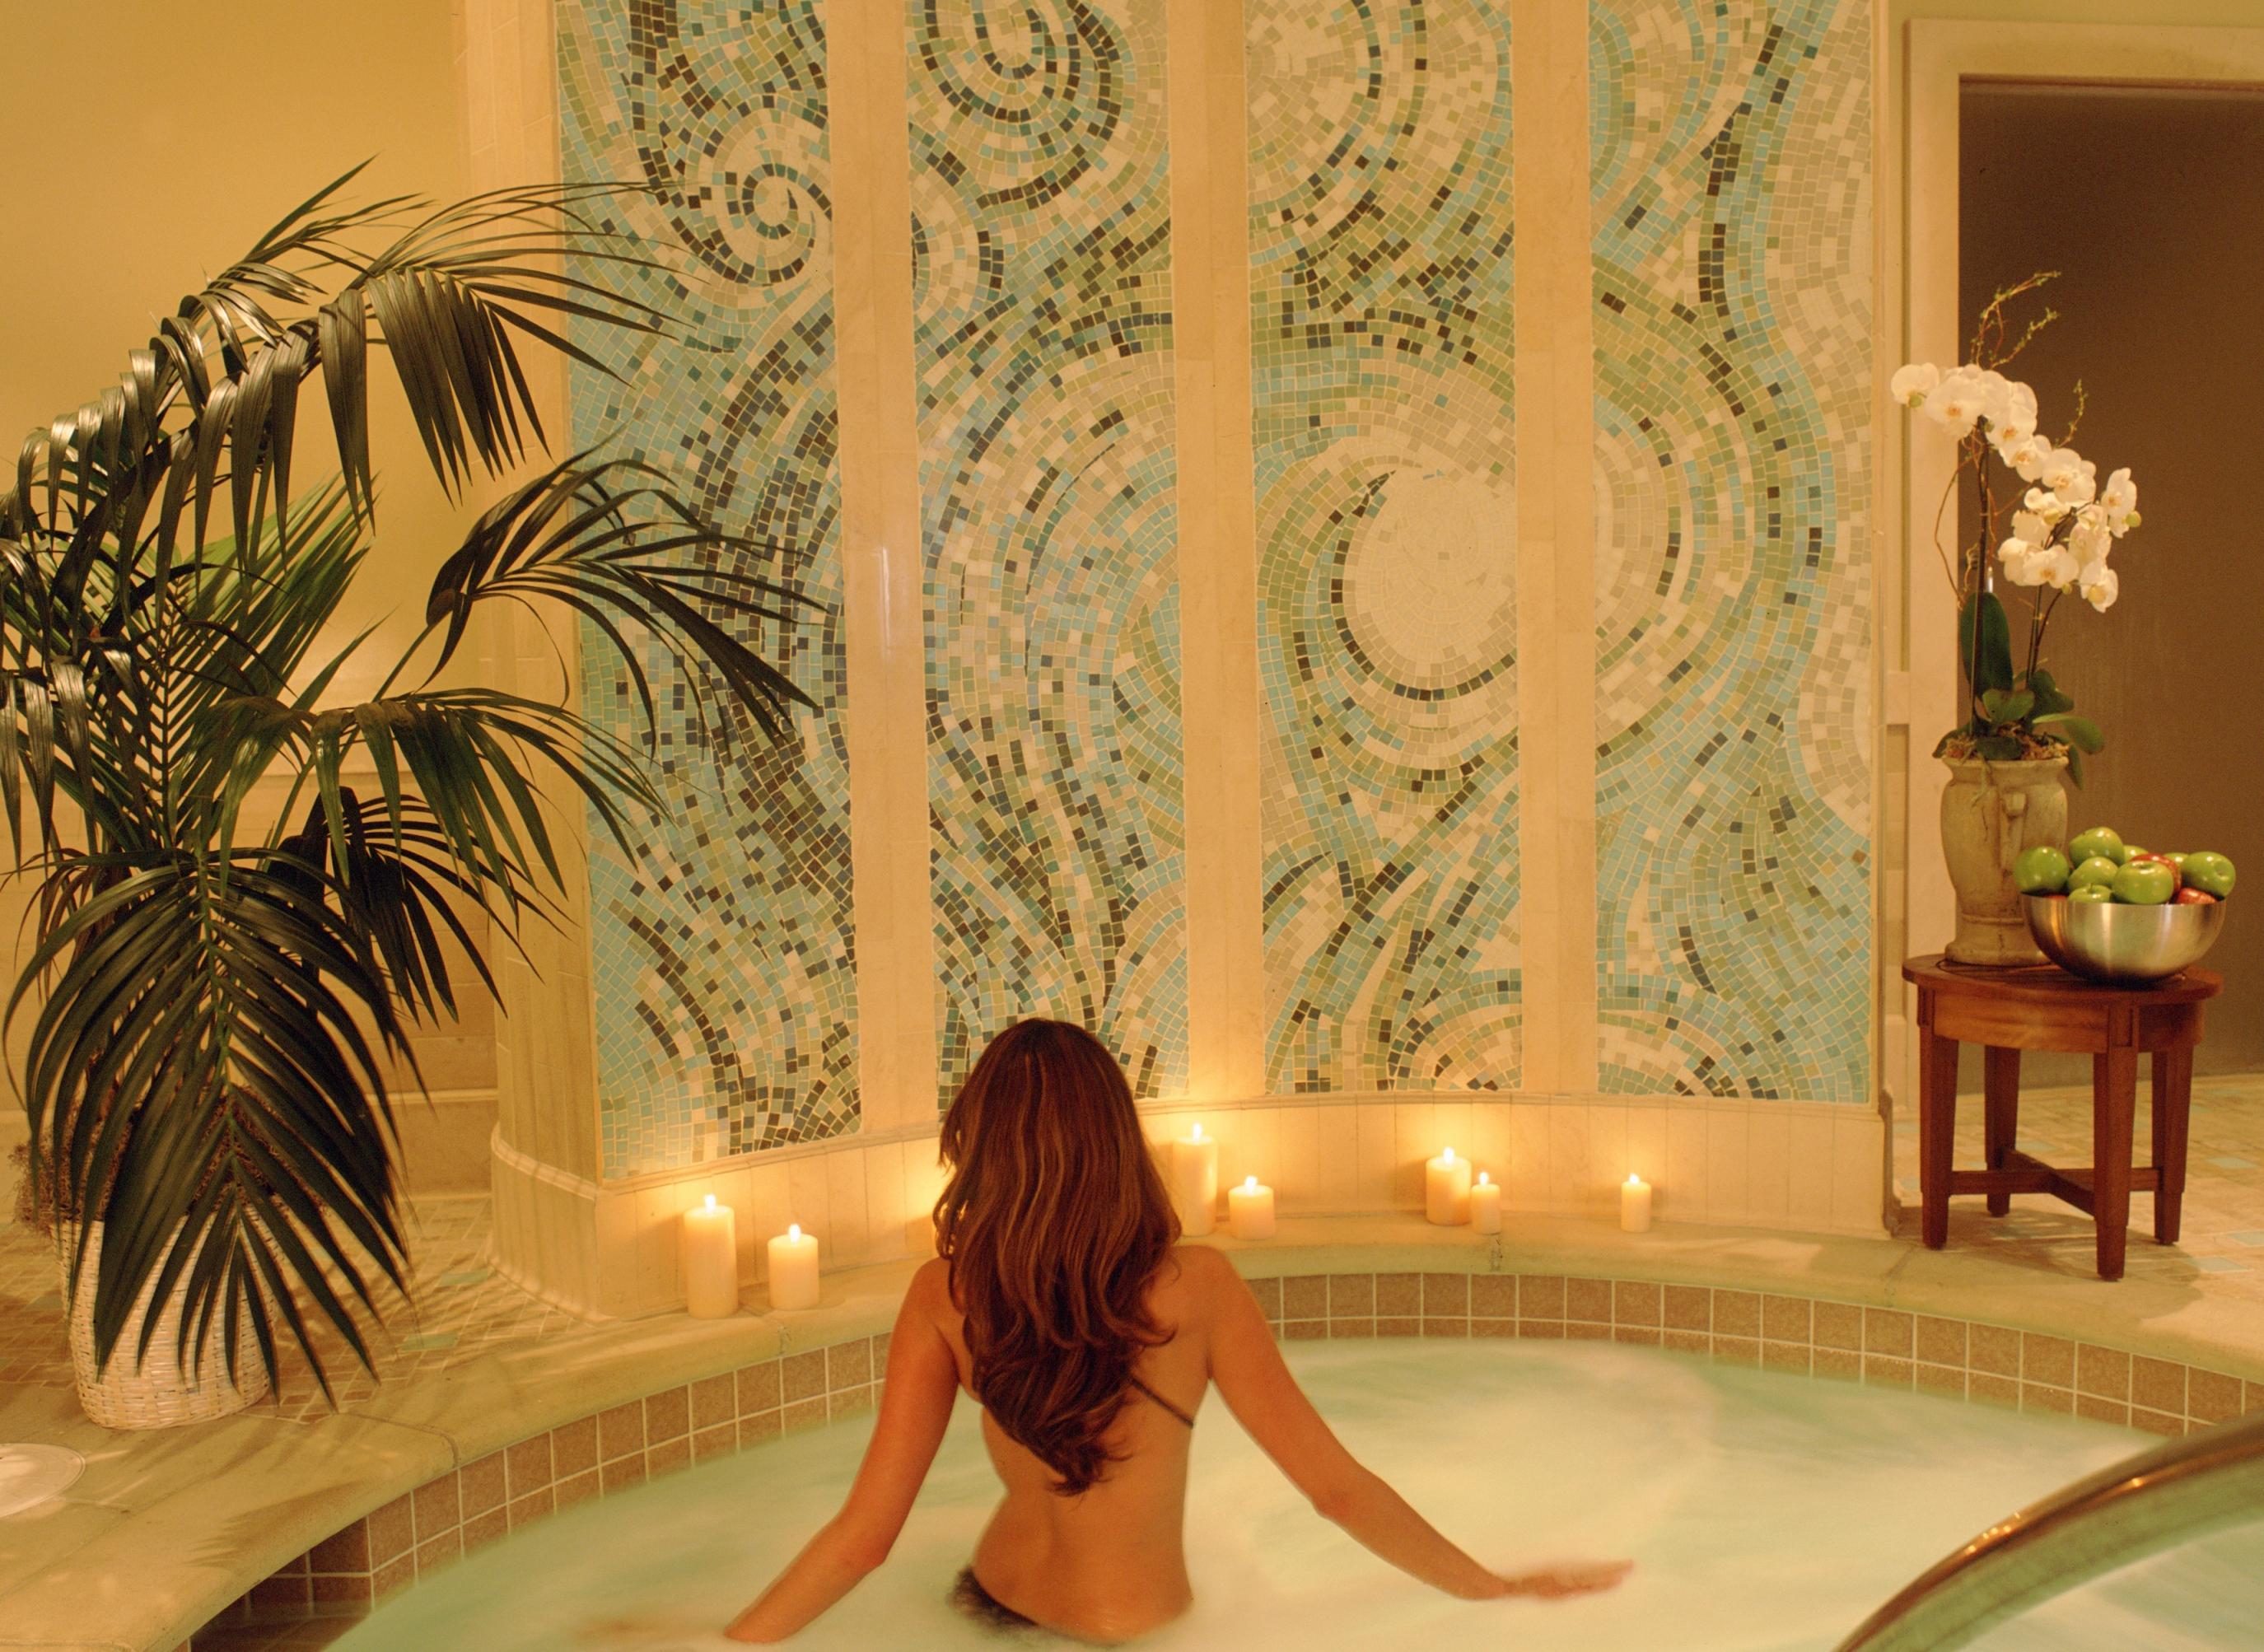 tub inn okcks en i hotels suites hoteldetail holiday romantic express us mn holidayinnexpress city southeast hot hotel and oklahoma ihg by